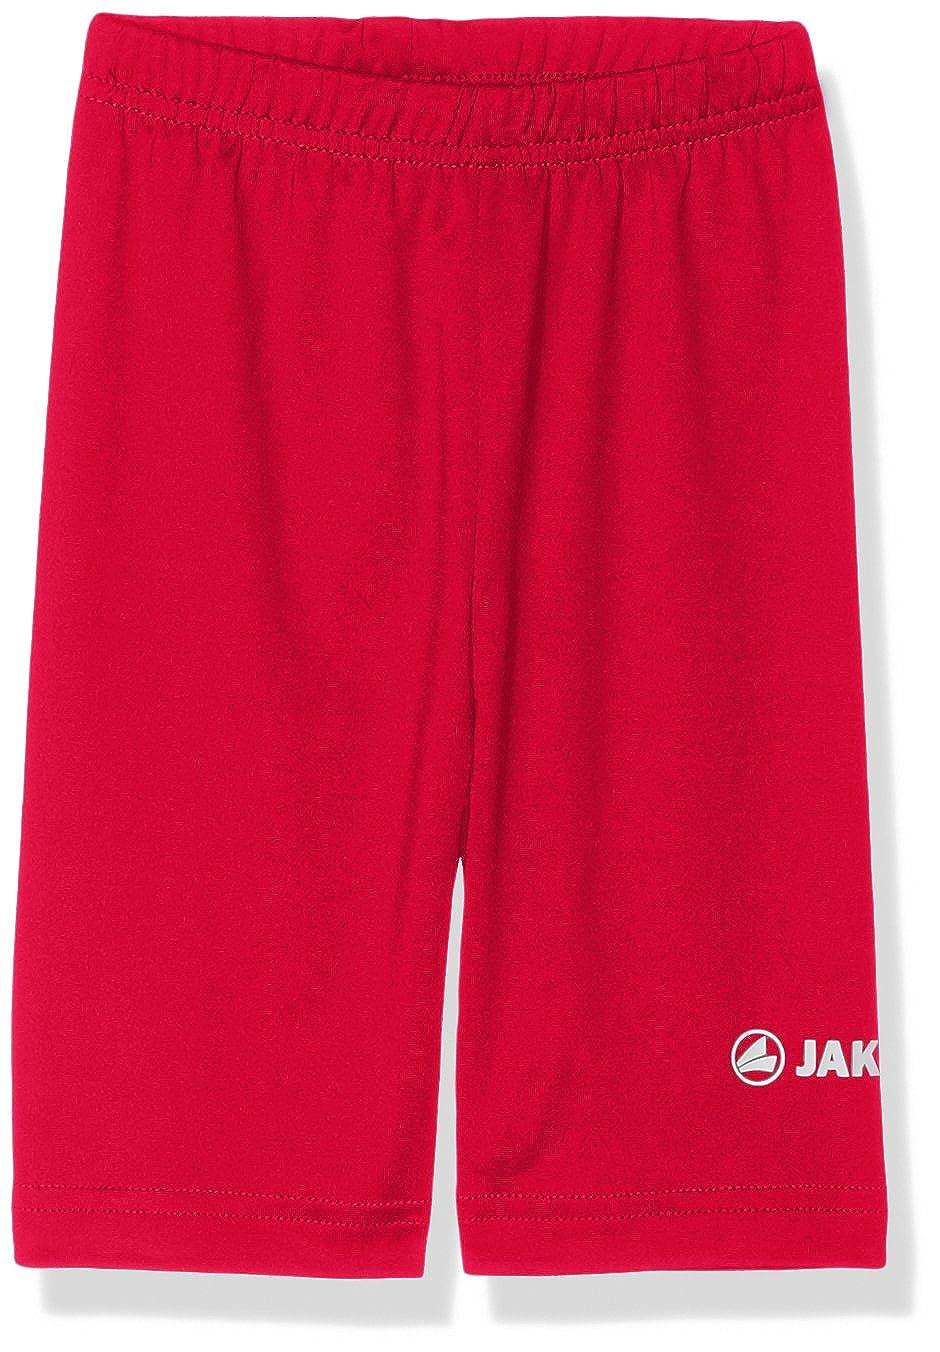 L Rojo JakoShort Basic 2.0 Rojo Pantalones cortos Unisex Adulto